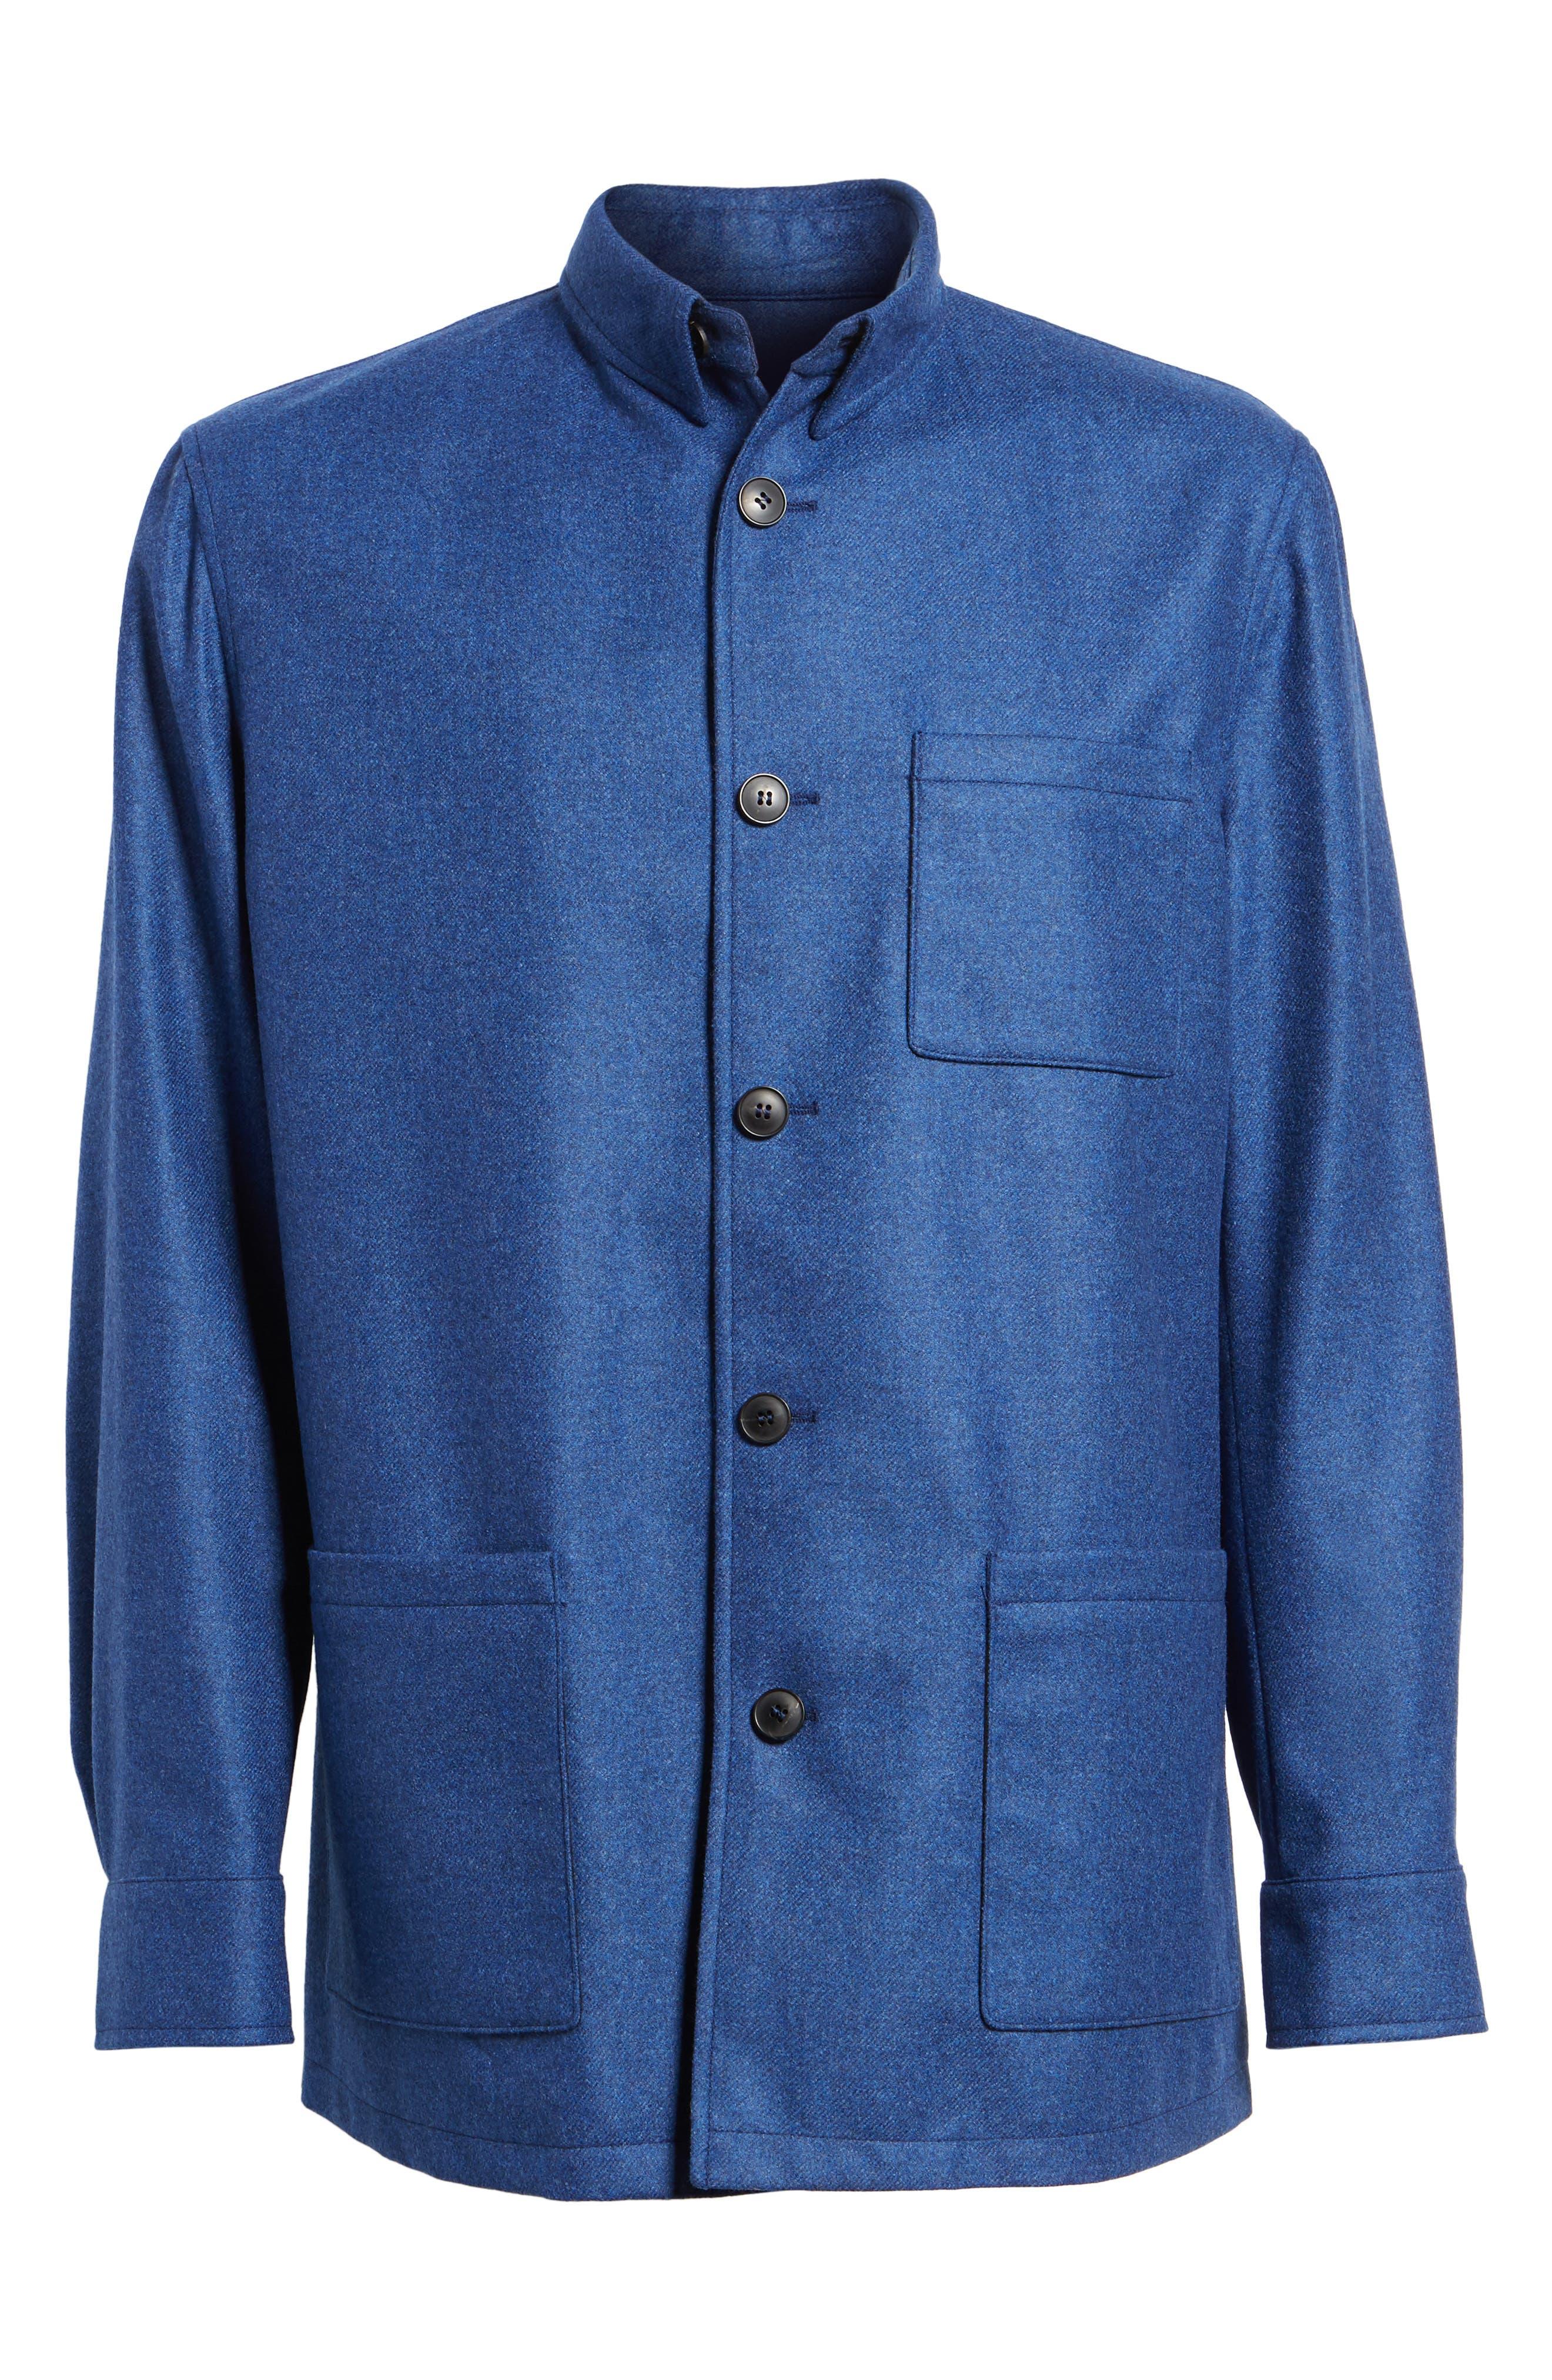 Loro Piana Storm System Shirt Jacket,                             Alternate thumbnail 24, color,